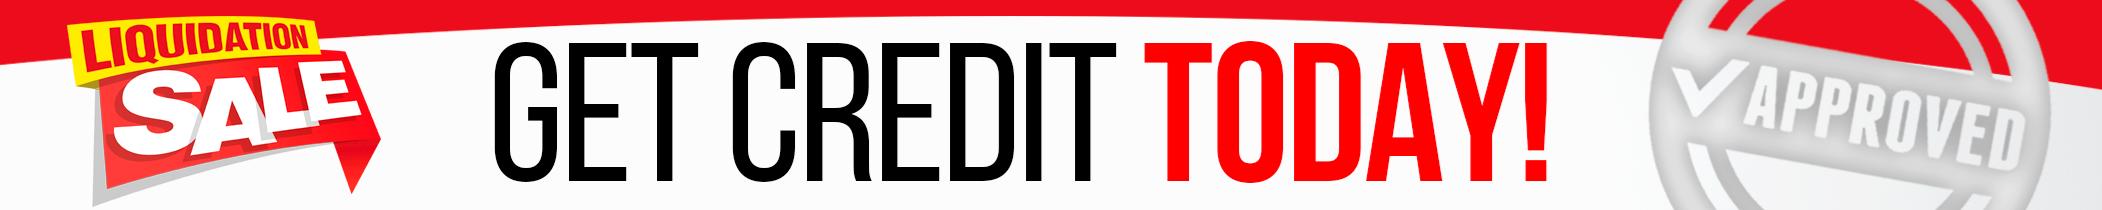 Get Credit Today!